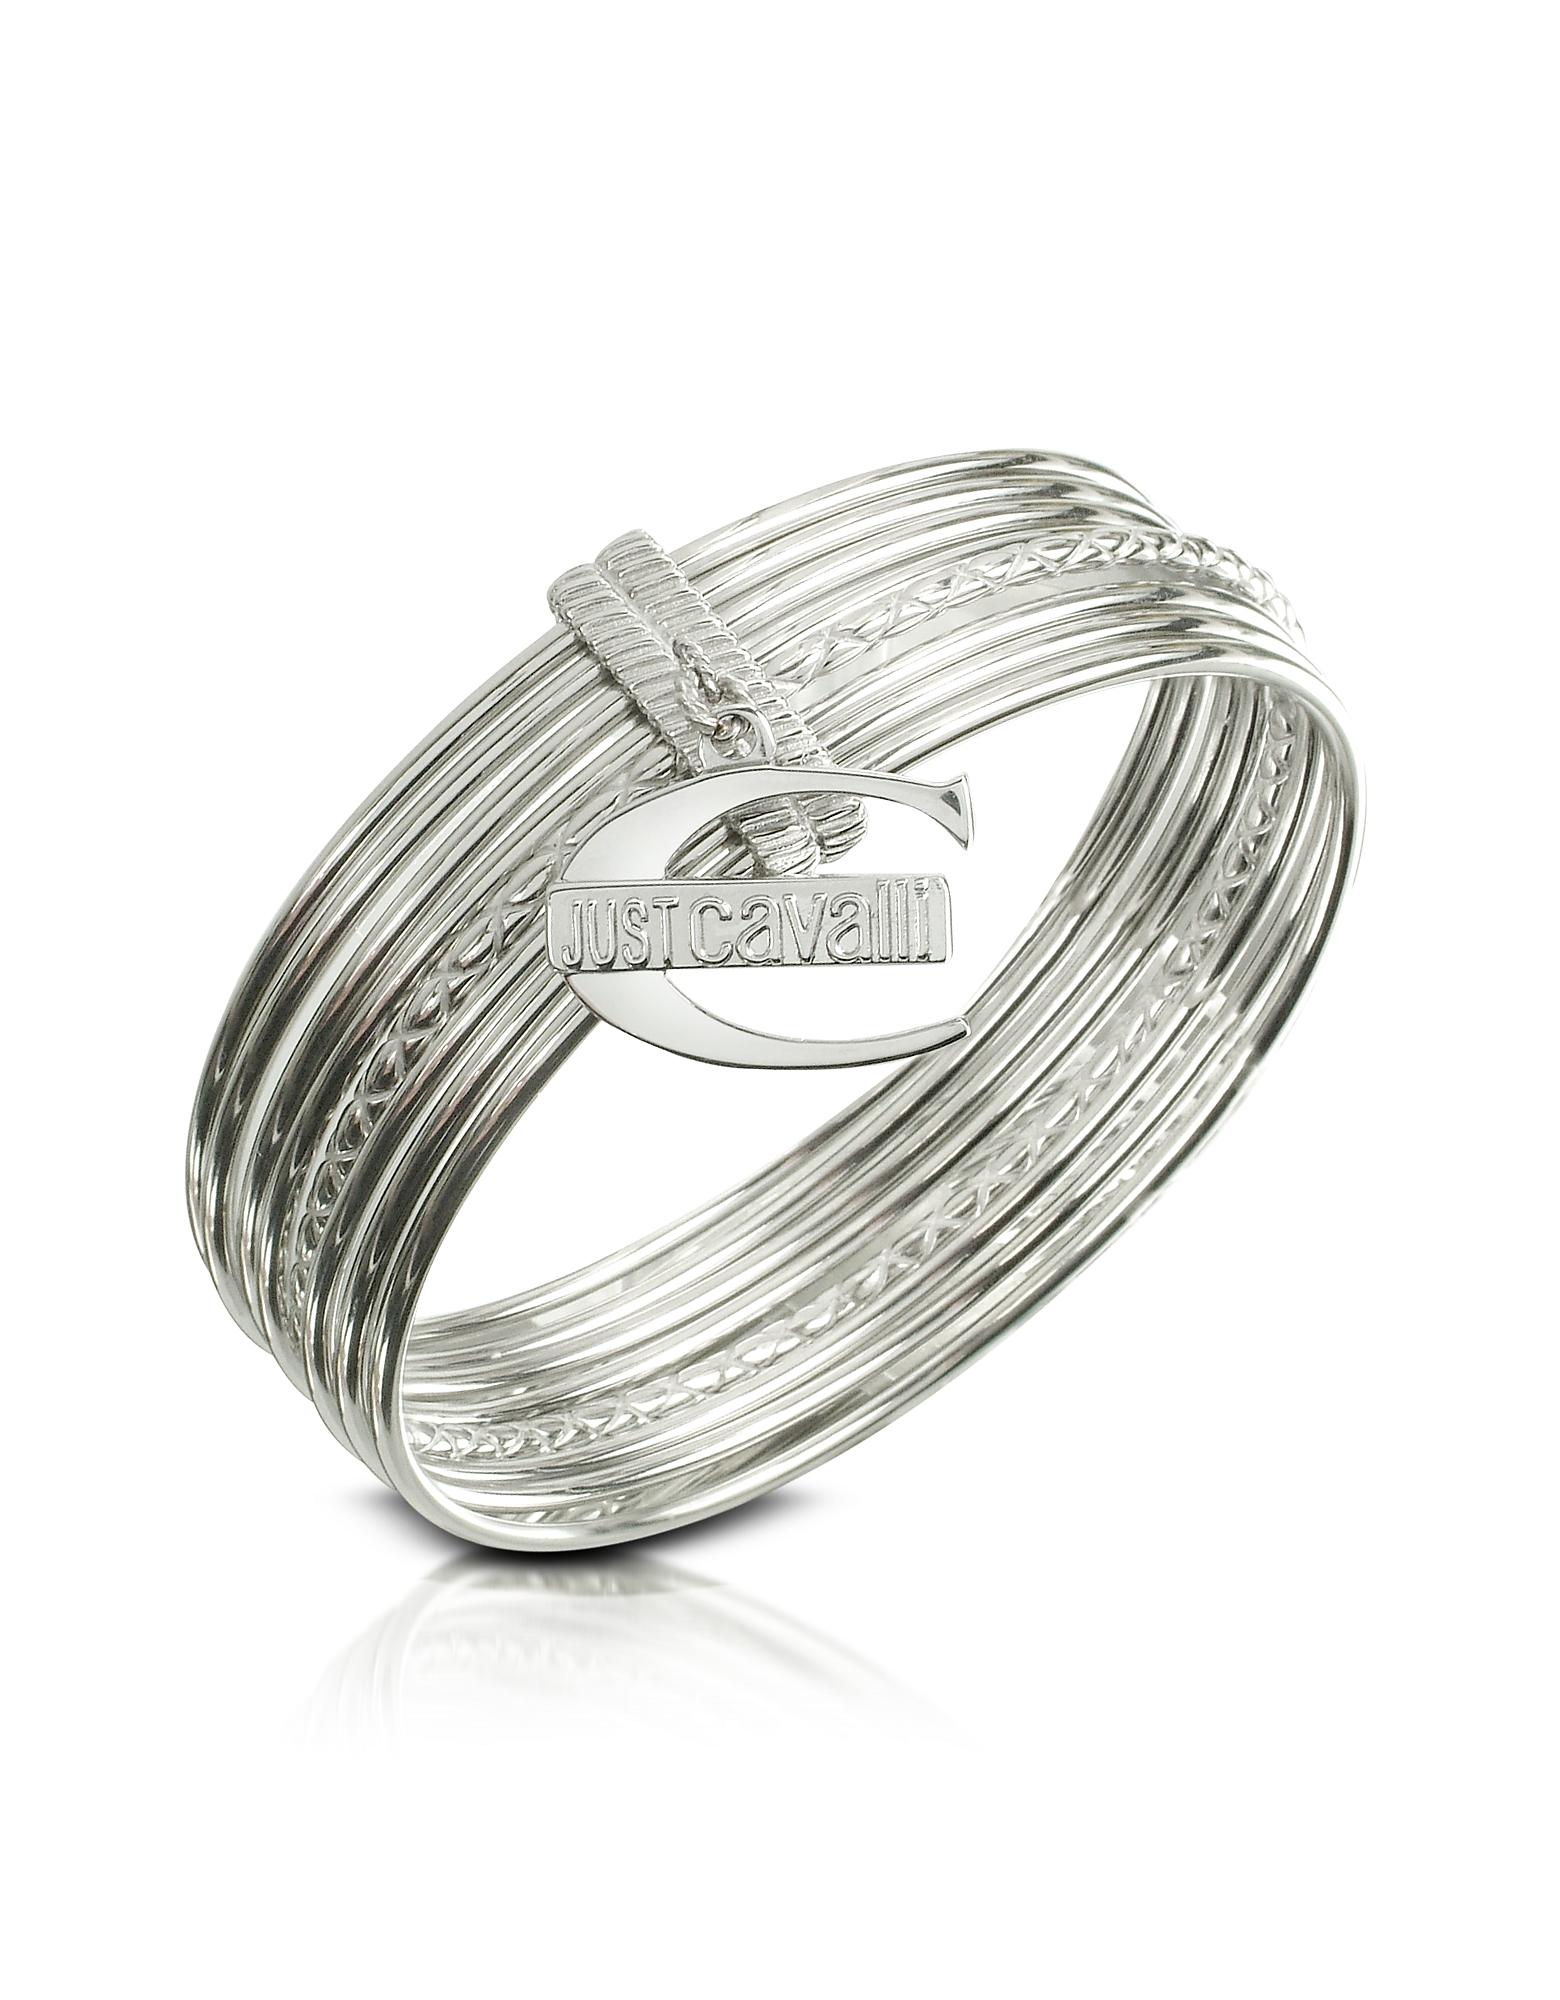 Just Cavalli Bracelets, Infinity - Logo Charm Stacked Bangle Bracelet